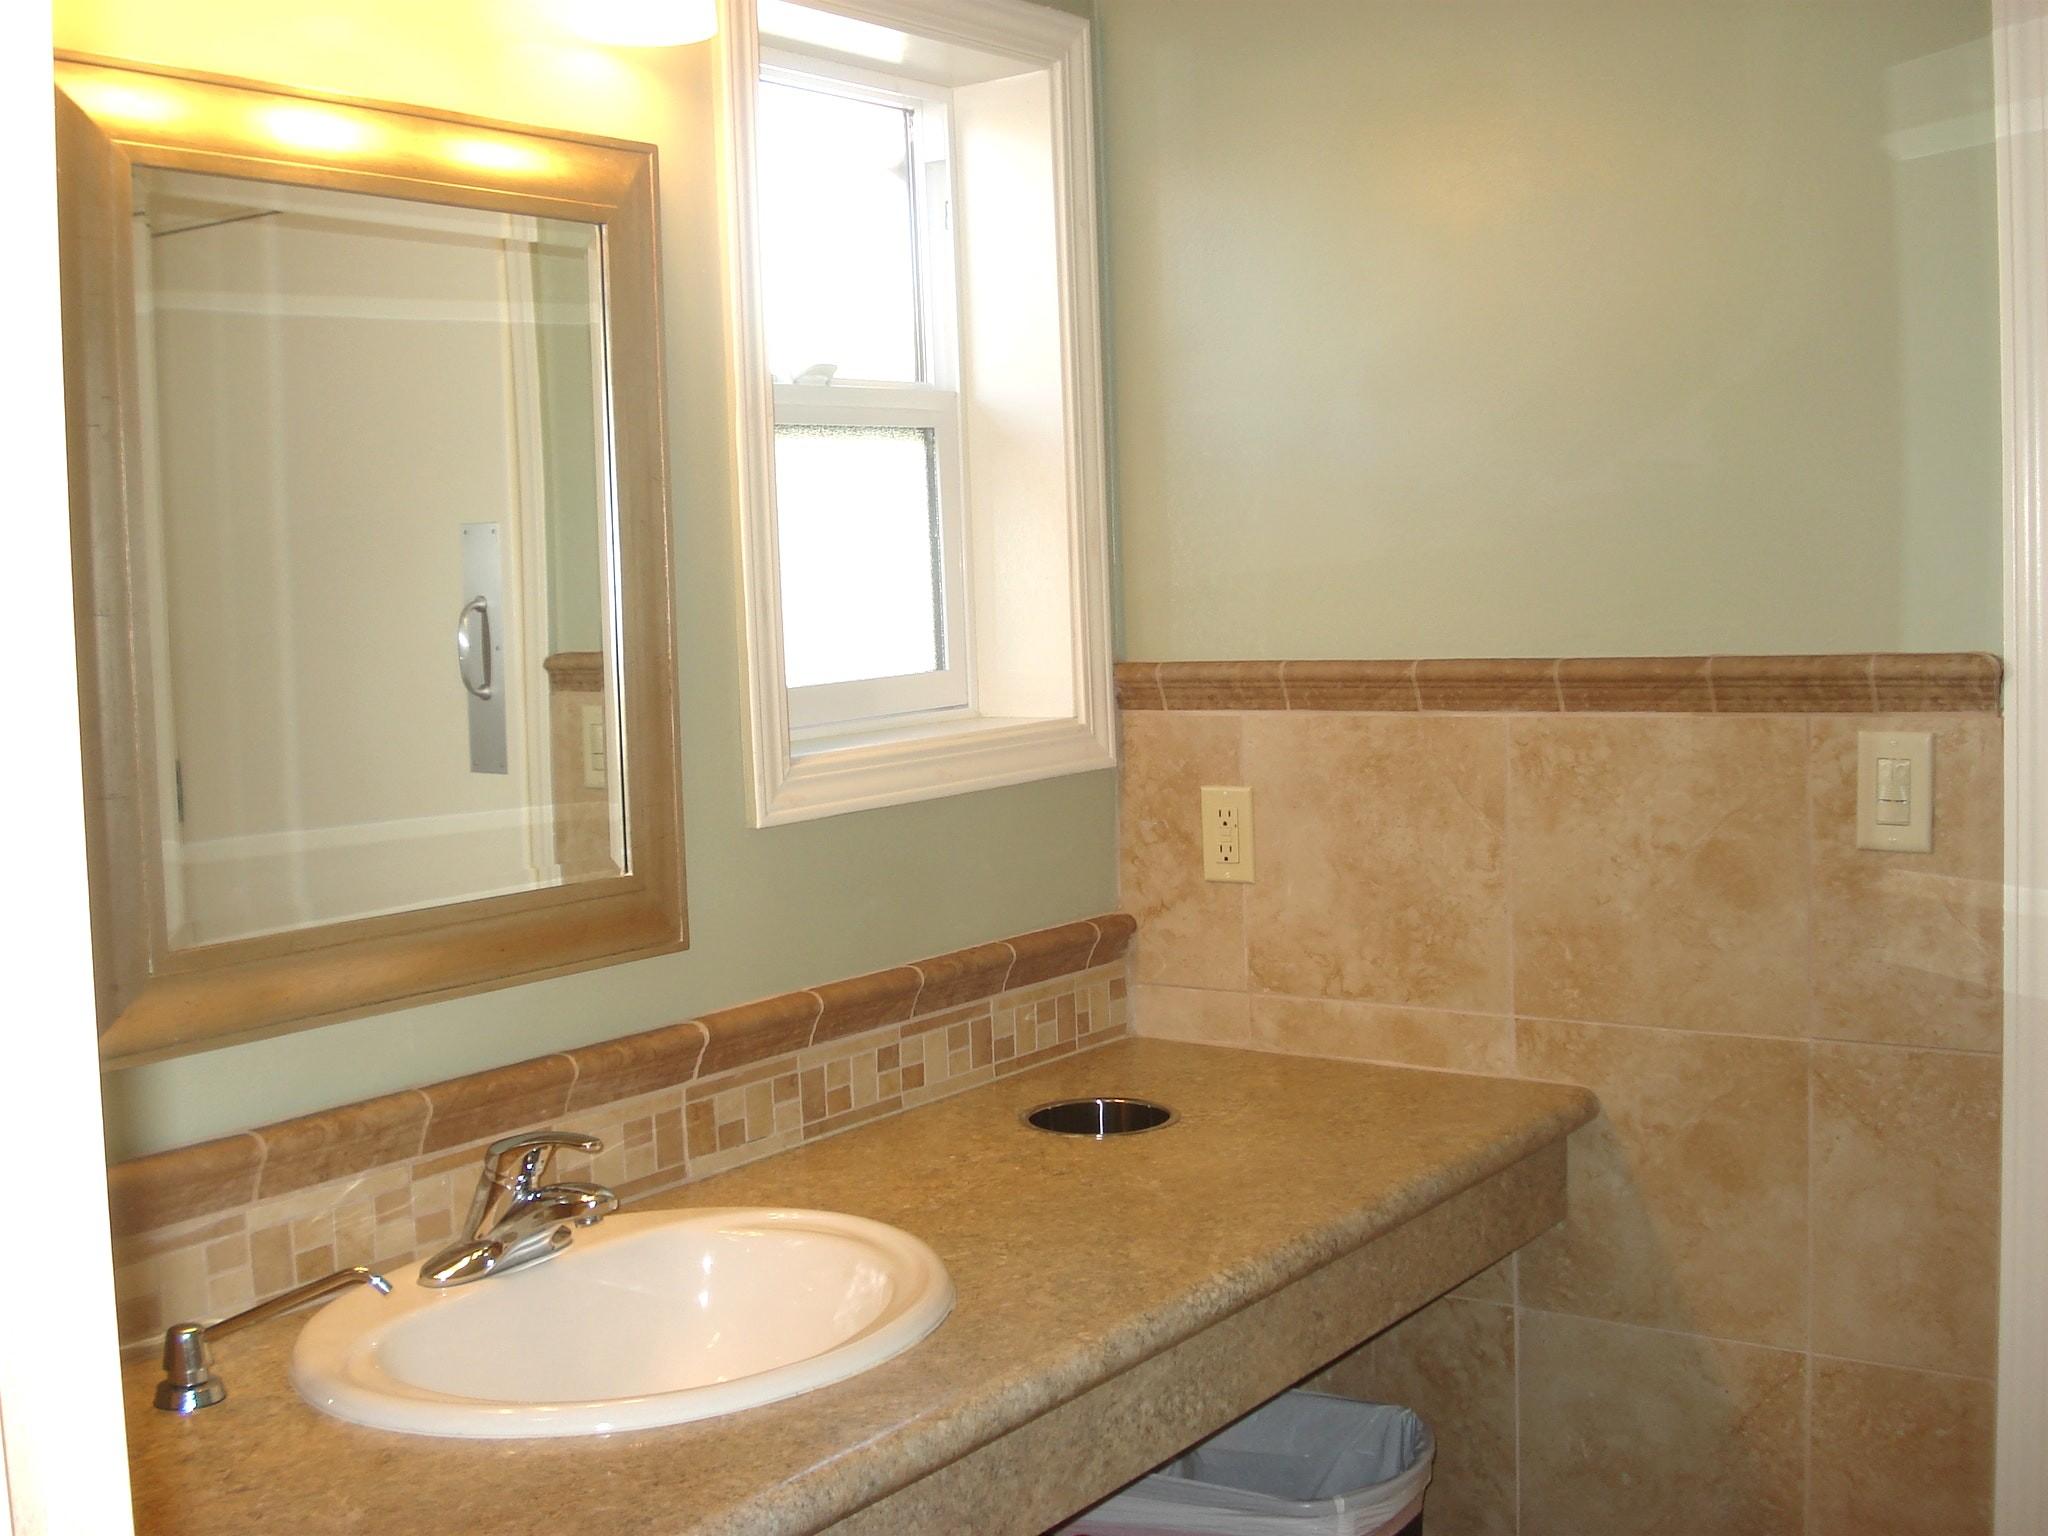 Bathroom Remodel Memphis Wonderful Bathrooms Design Bathroom Remodeling Construction In California Online